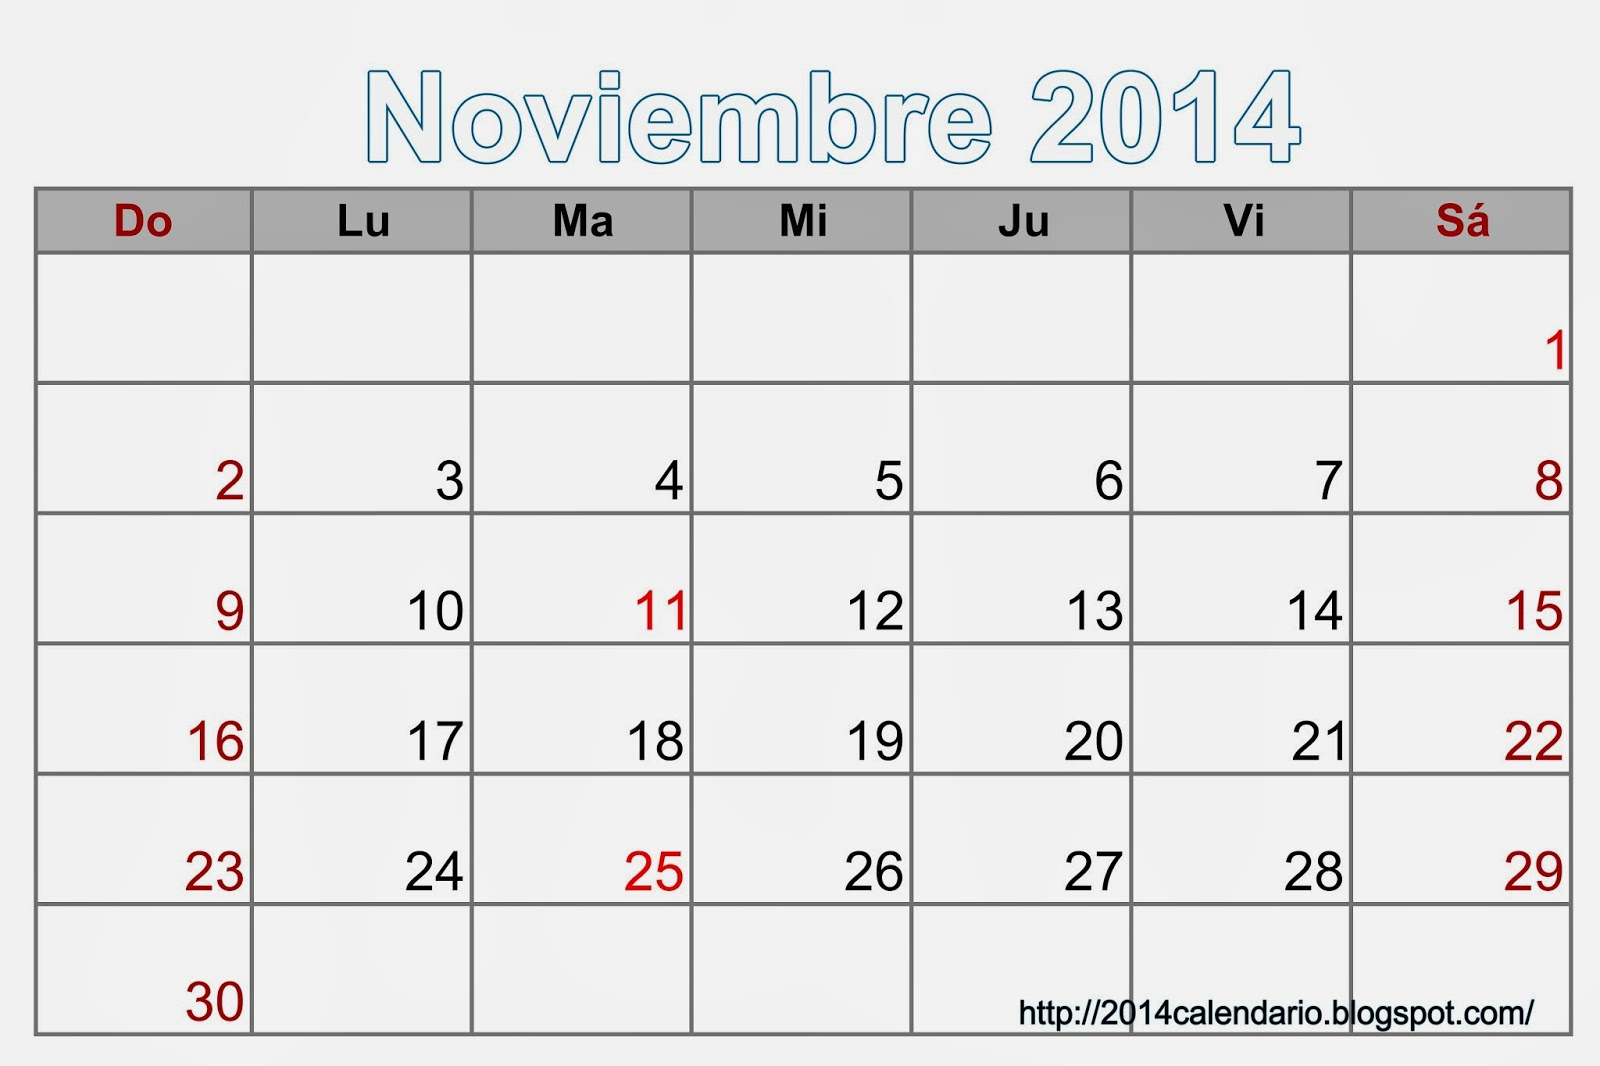 ... guardar la imagen de calendario para Noviembre 2014 calendar